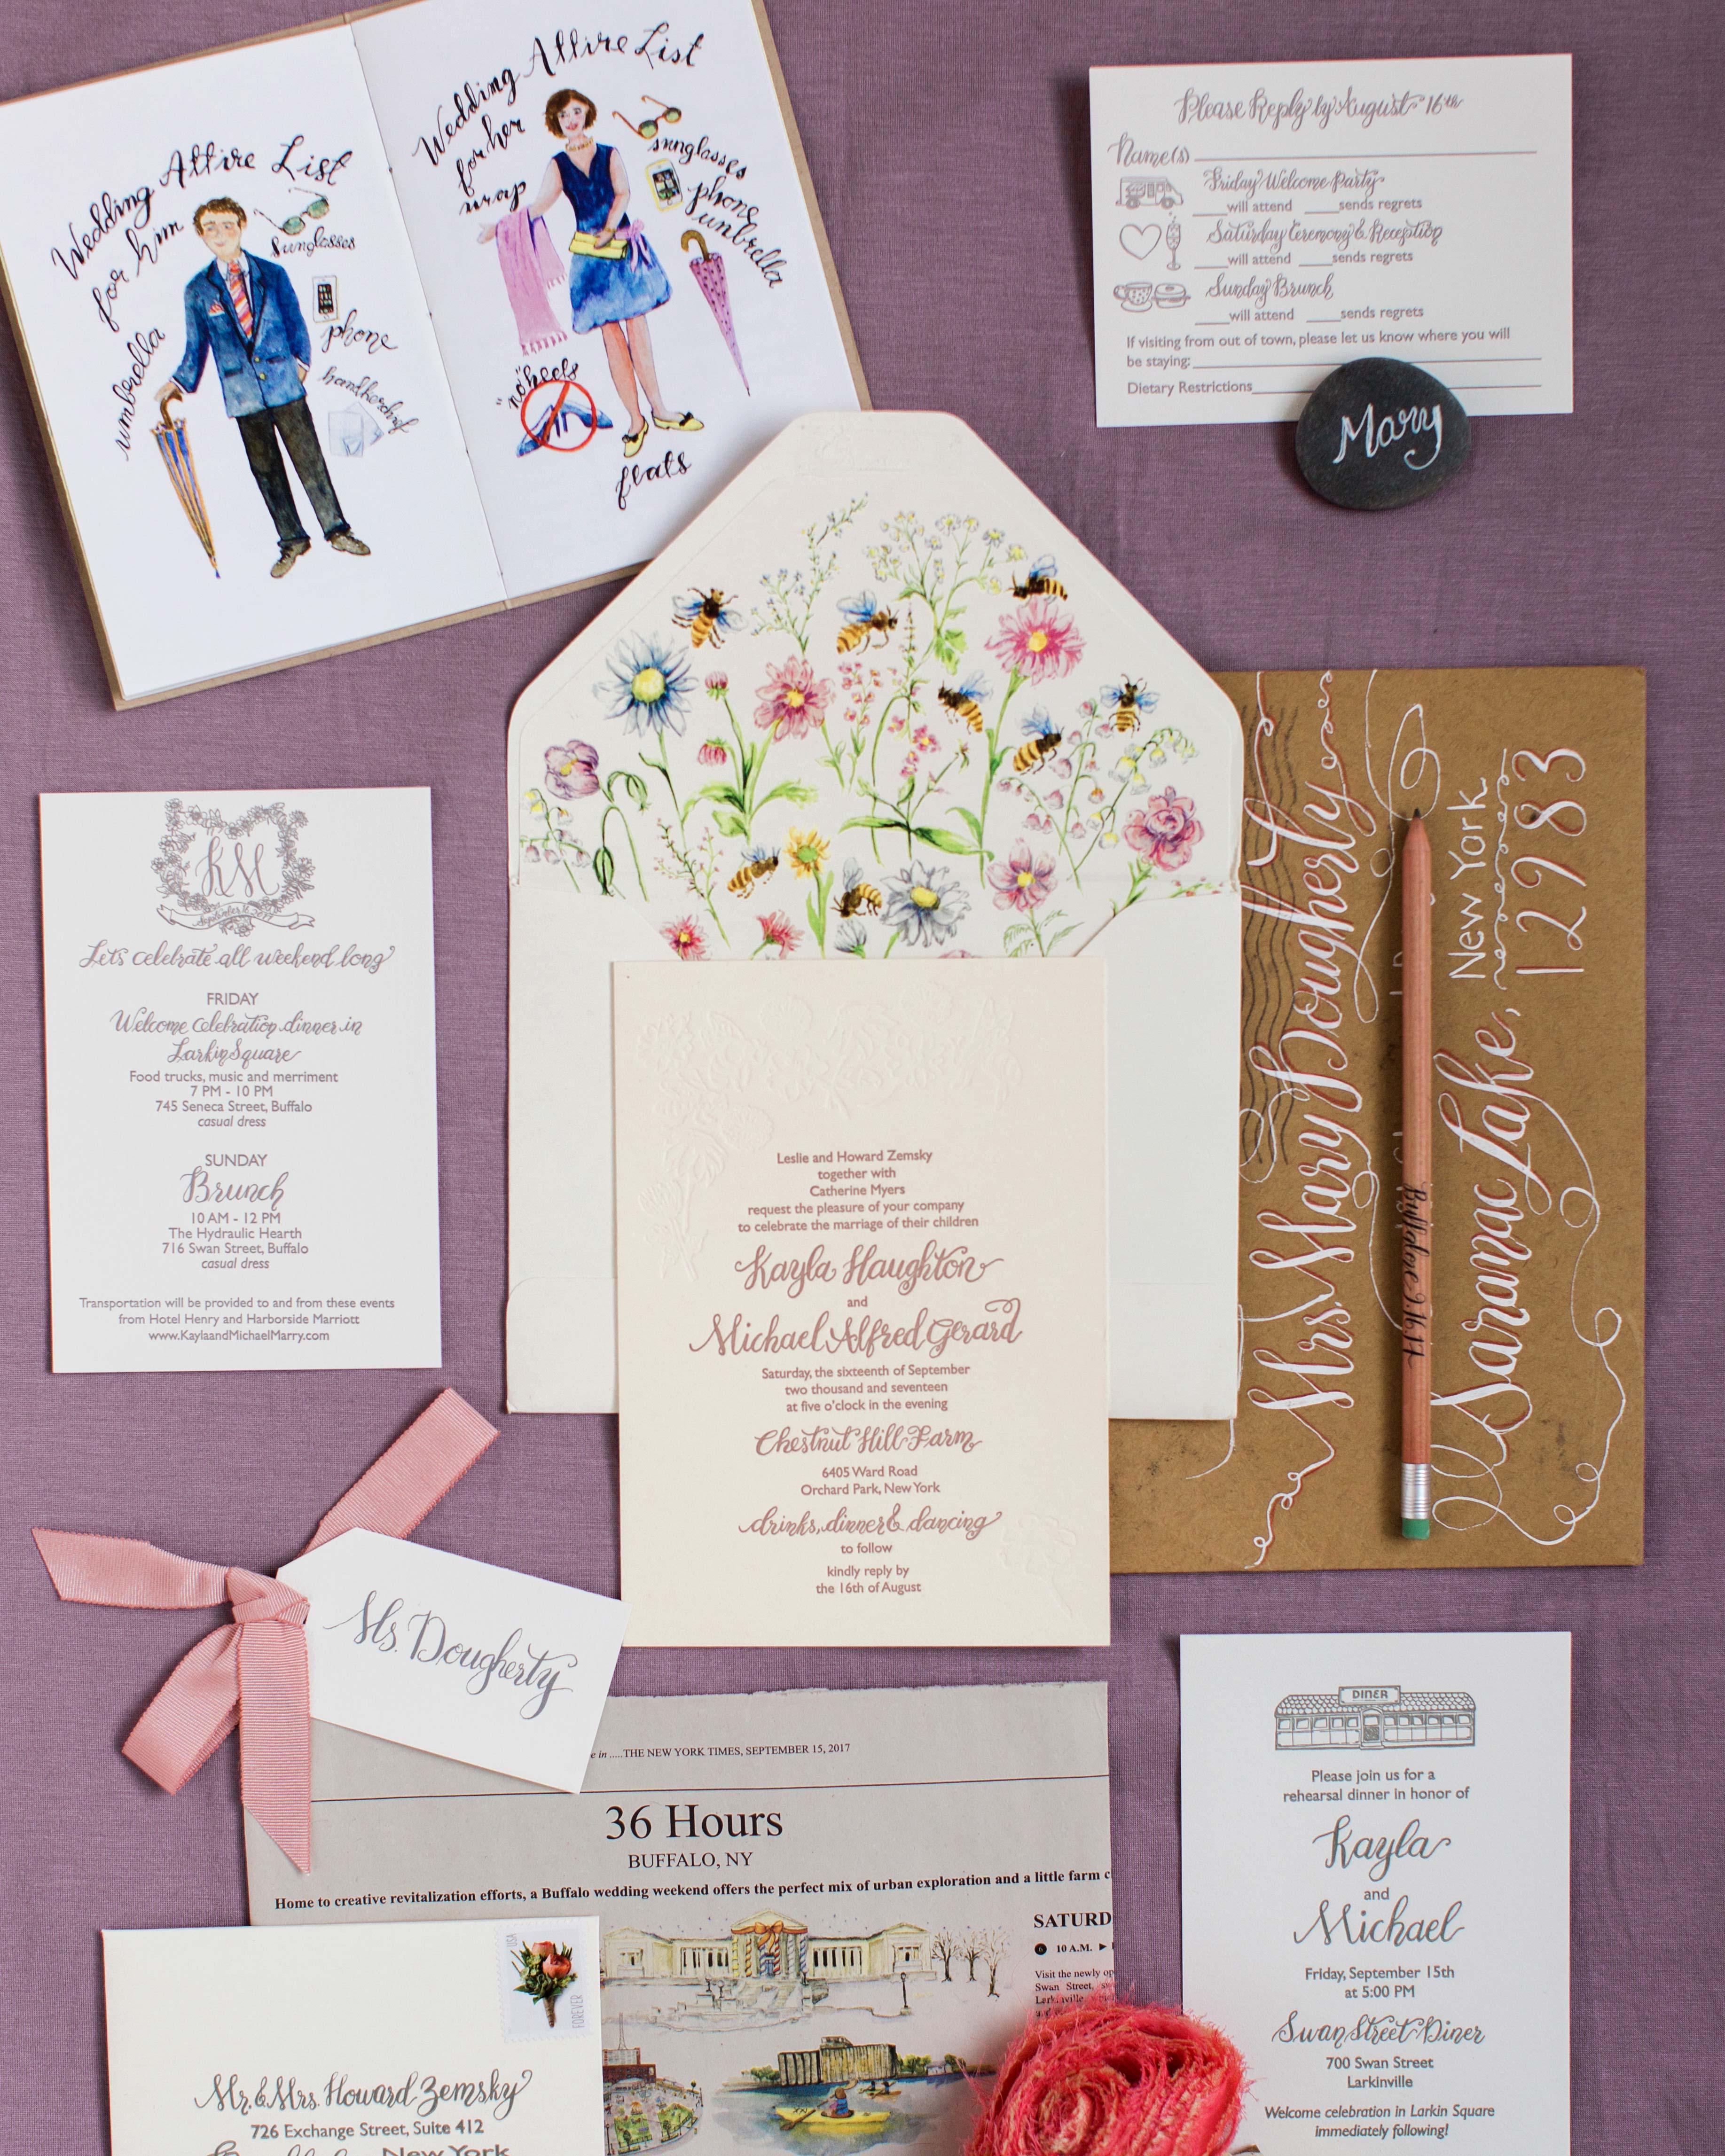 kayla michael wedding invitation